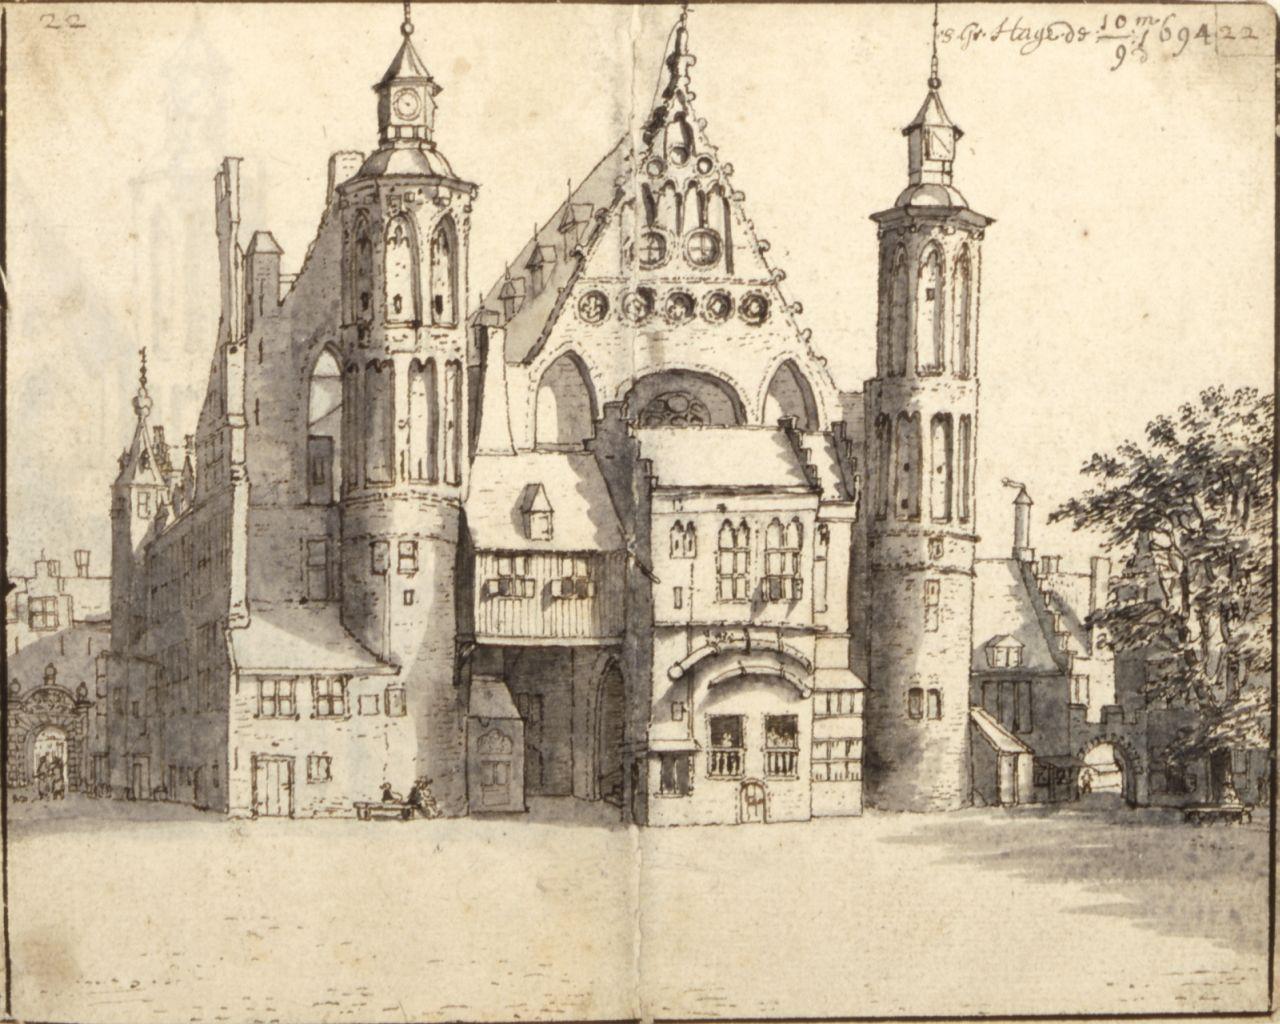 Daterende middeleeuwse gebouwen